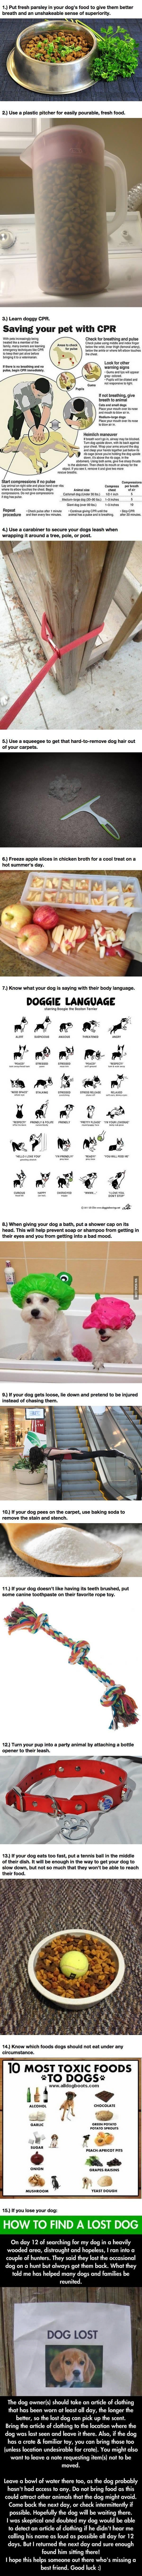 Tips for dog parents <3: